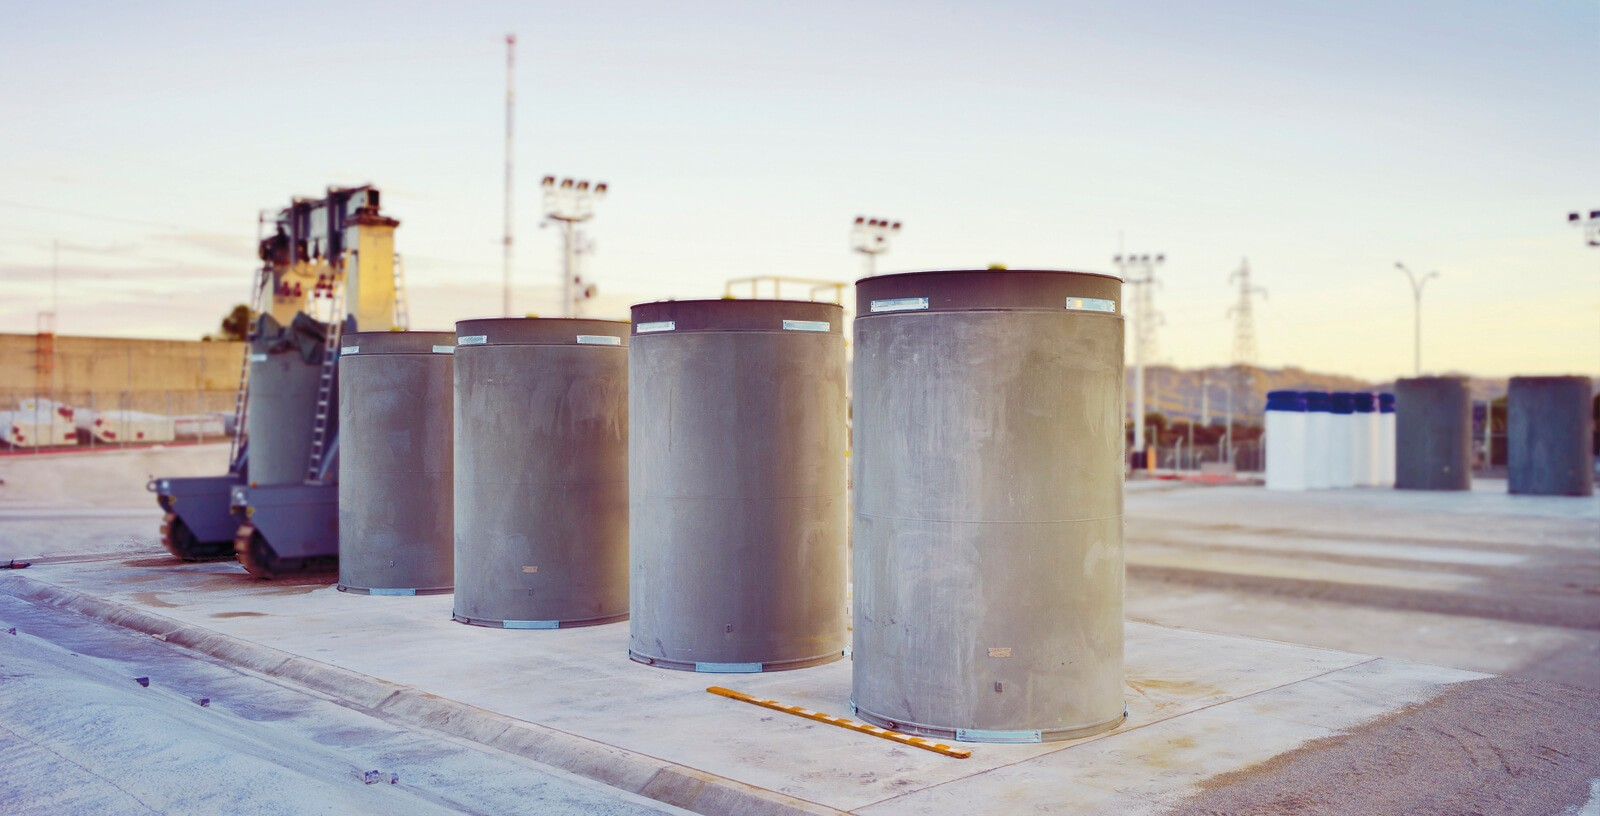 Idom_Nuclear_Services_ANAV_Individual_Spent_Fuel_Storage_Installation_ISFSI_ATI_Asc__nuclear_power_plant_CNAS_Jordi_Estrampes